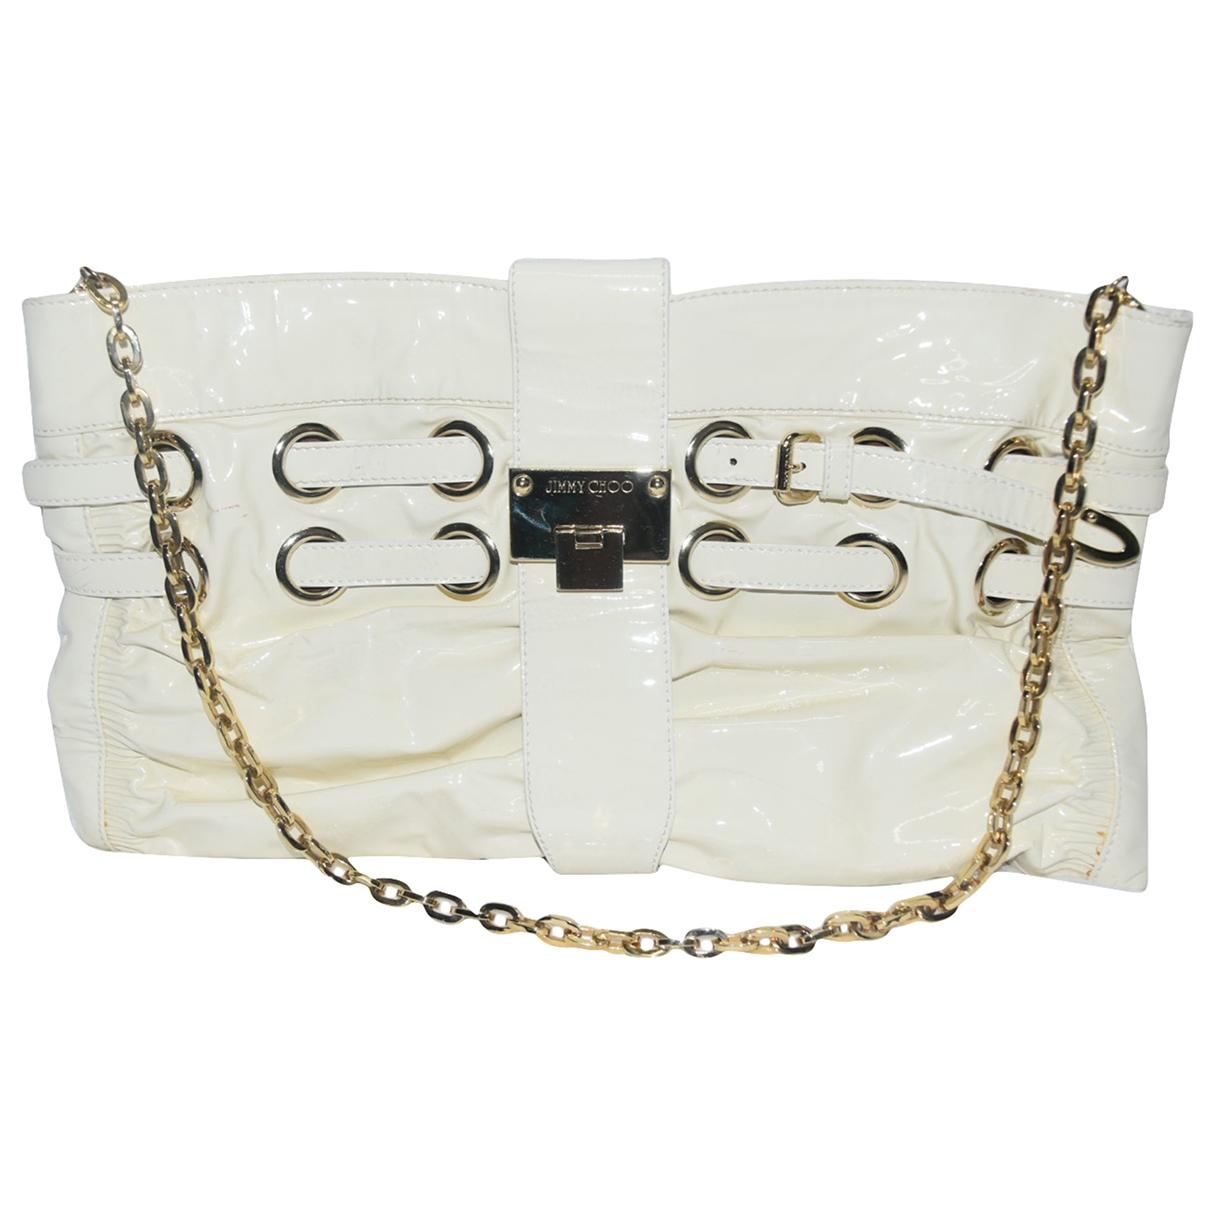 Jimmy Choo \N White Patent leather handbag for Women \N